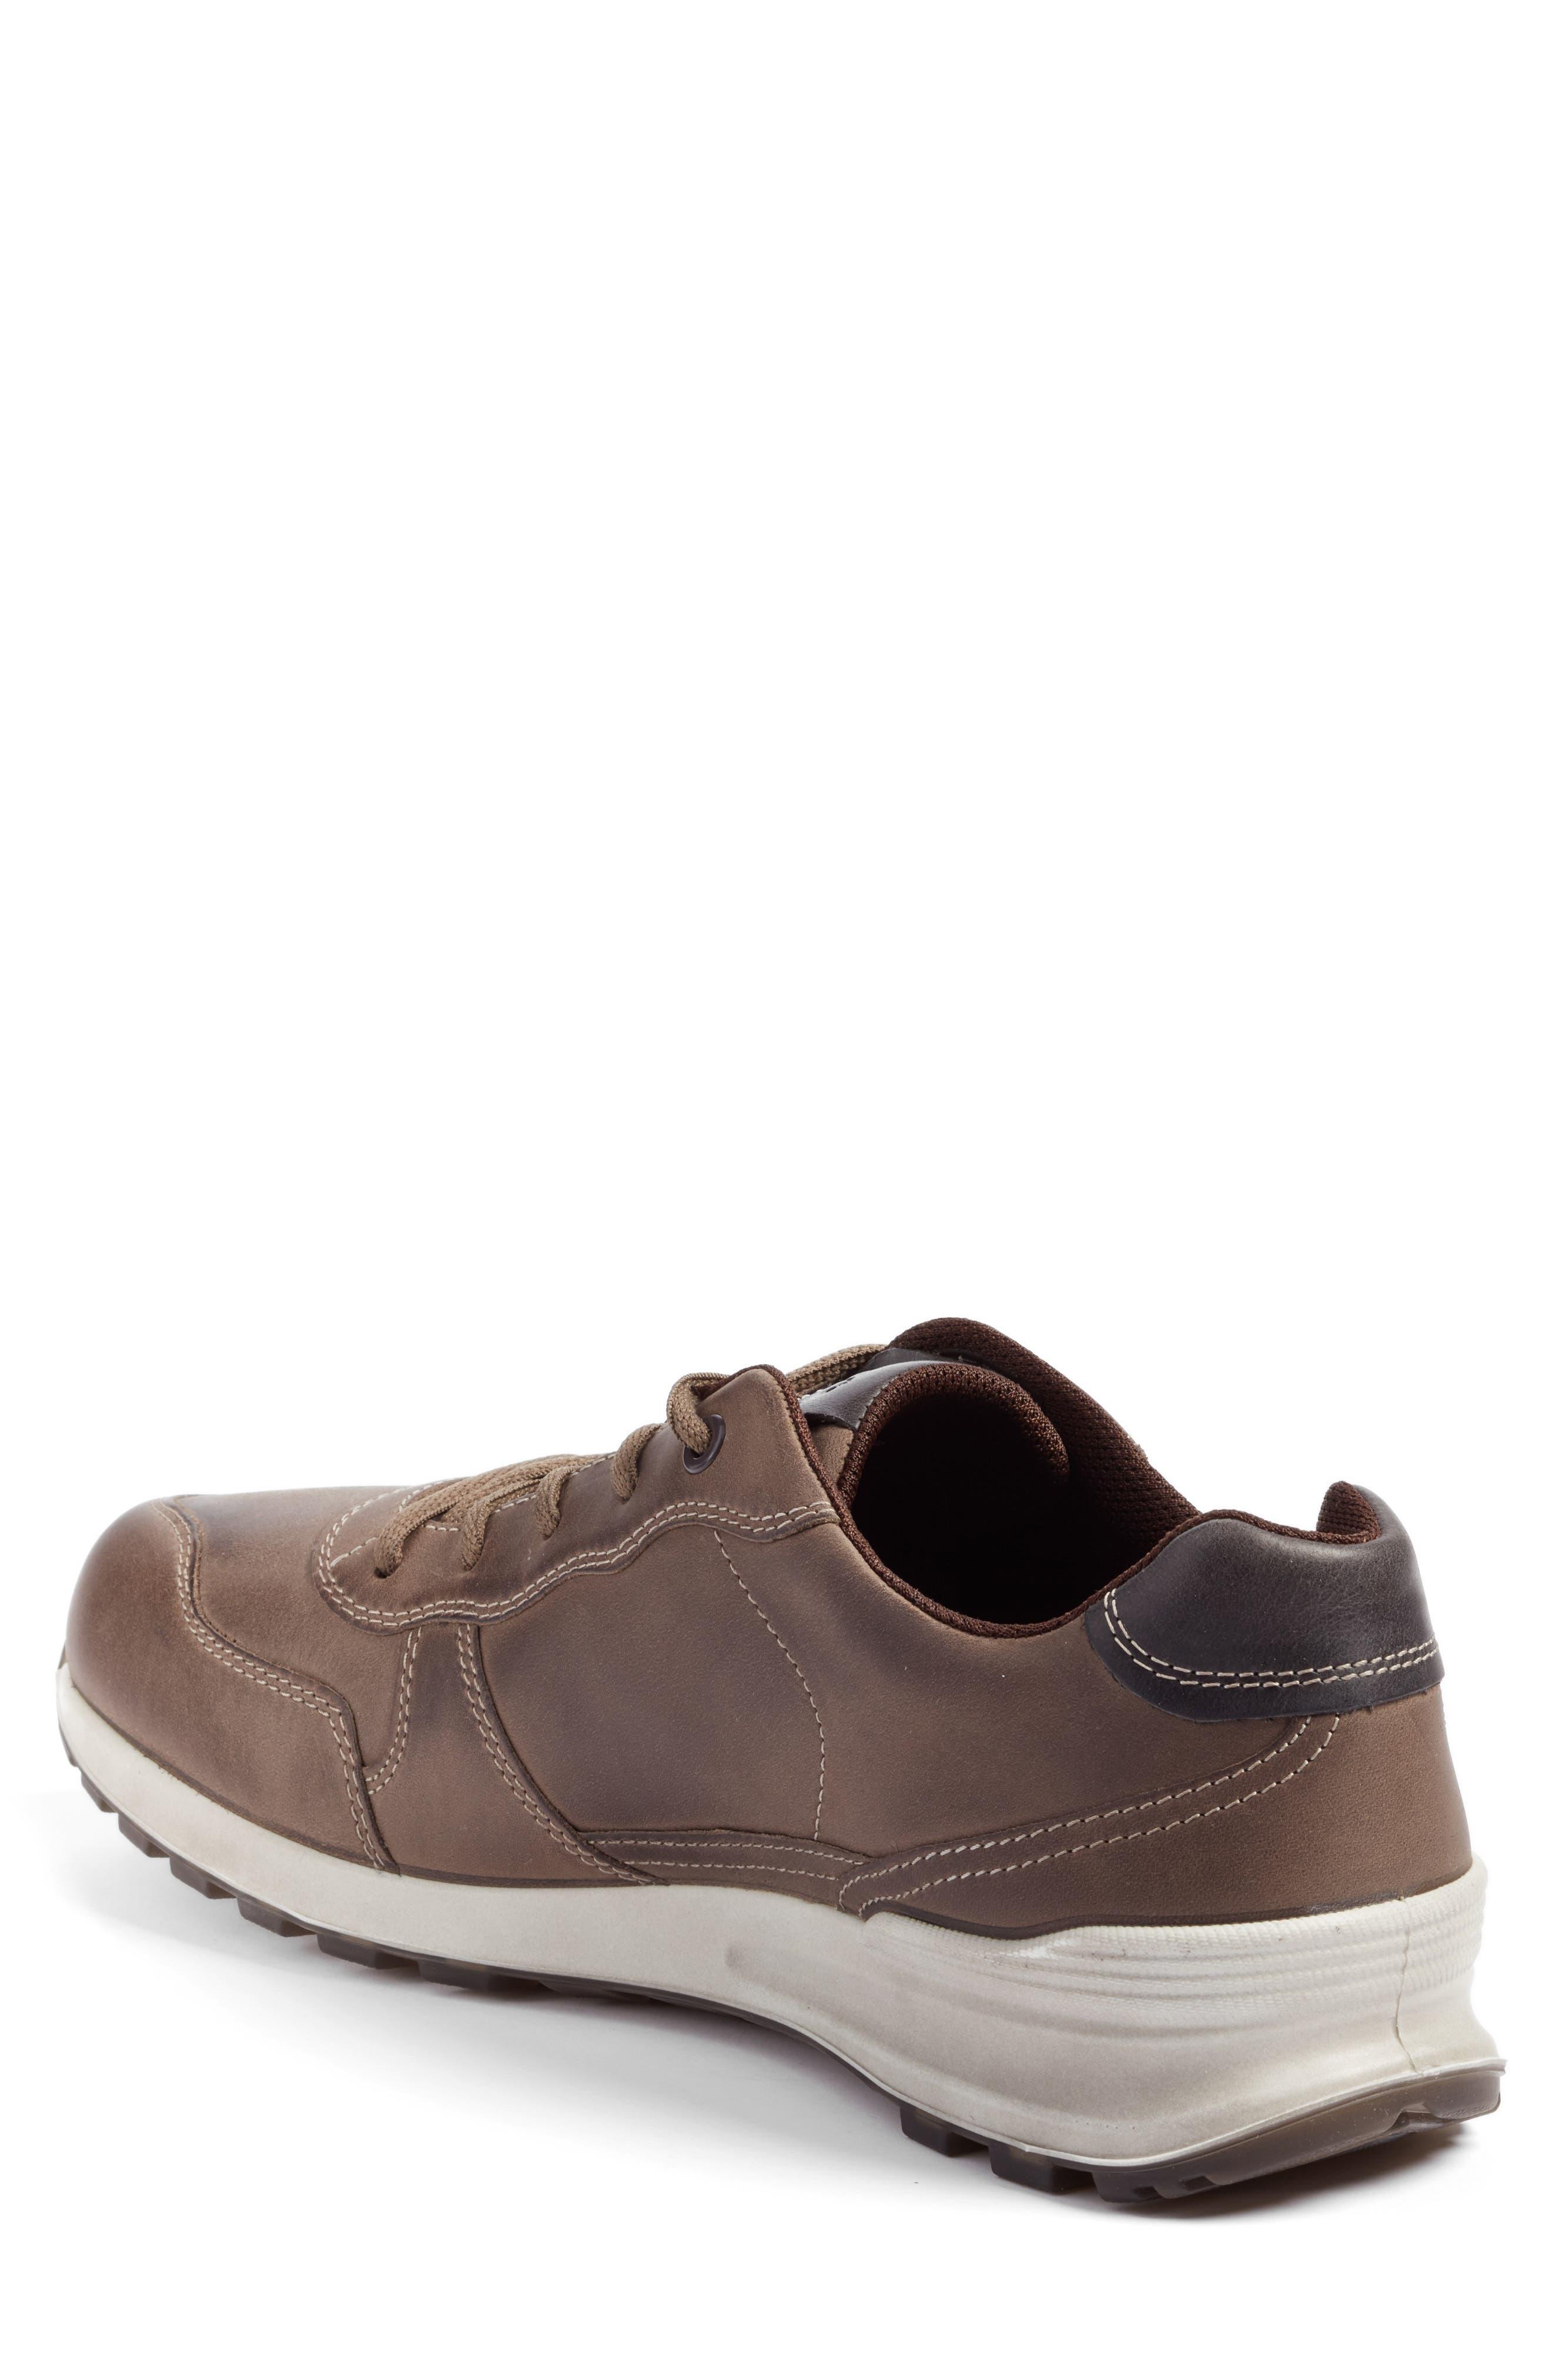 CS14 Retro Sneaker,                             Alternate thumbnail 4, color,